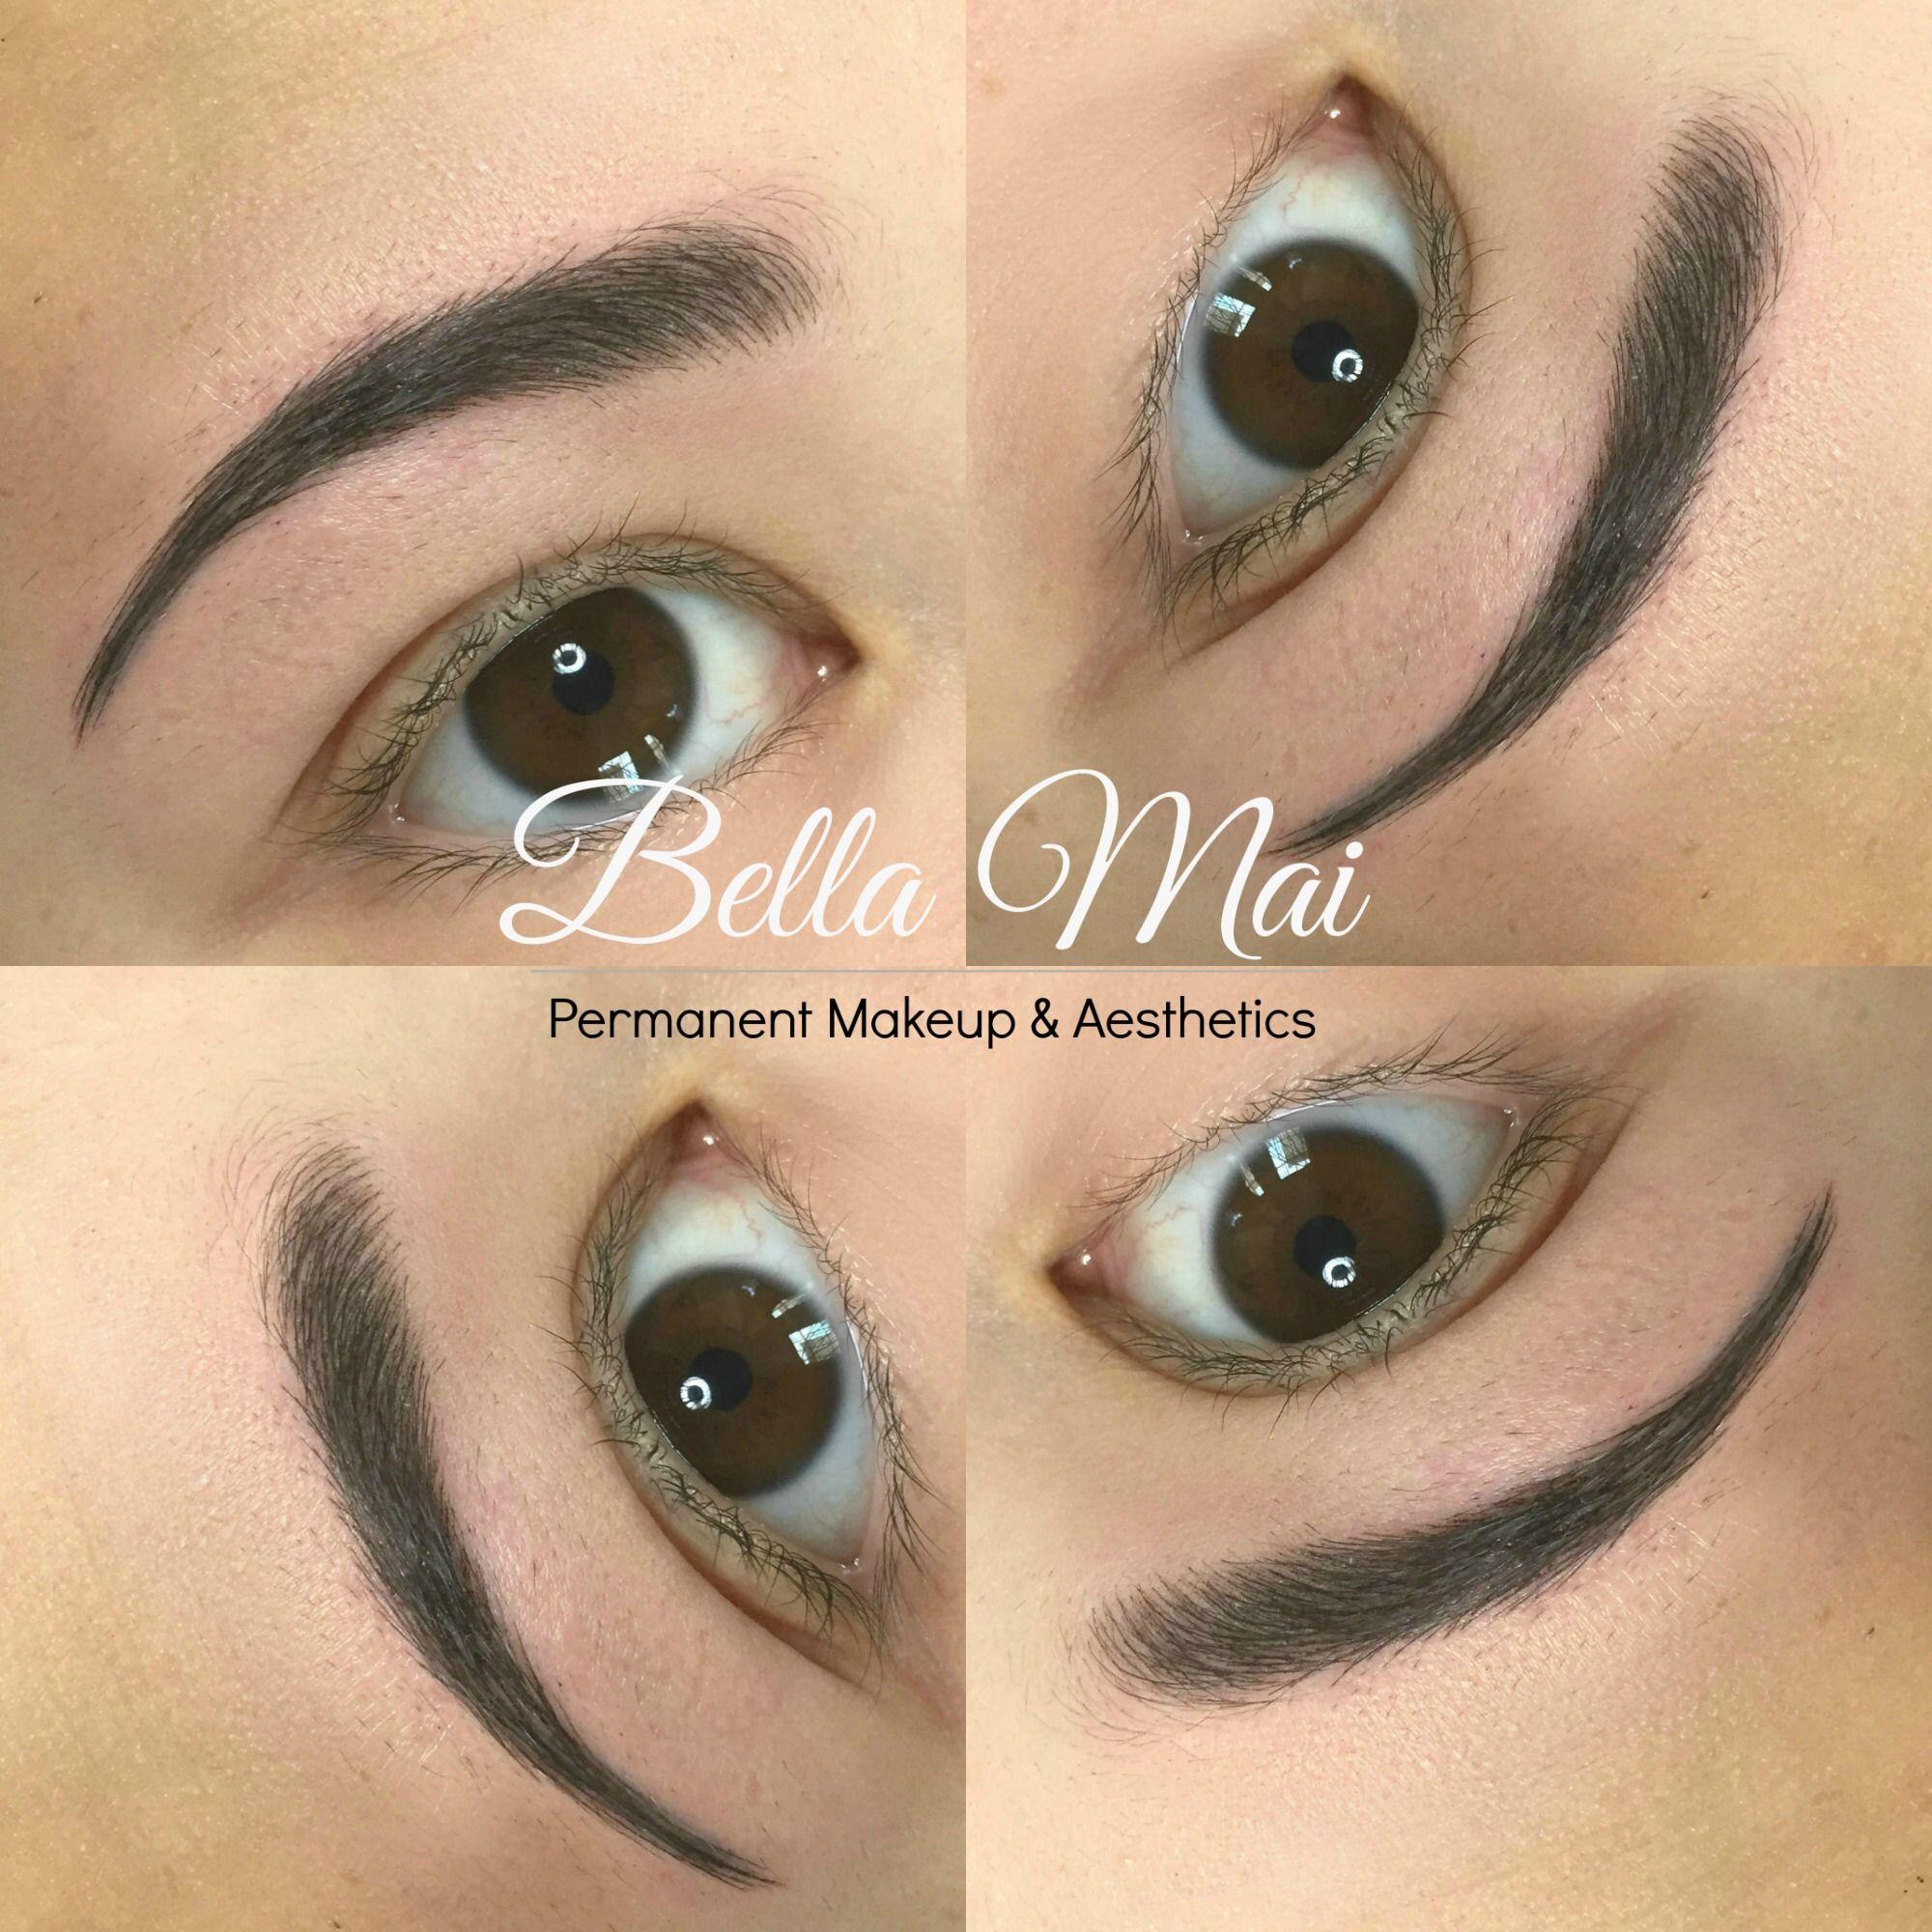 Eyebrow Microblading (With images) Eyebrow makeup